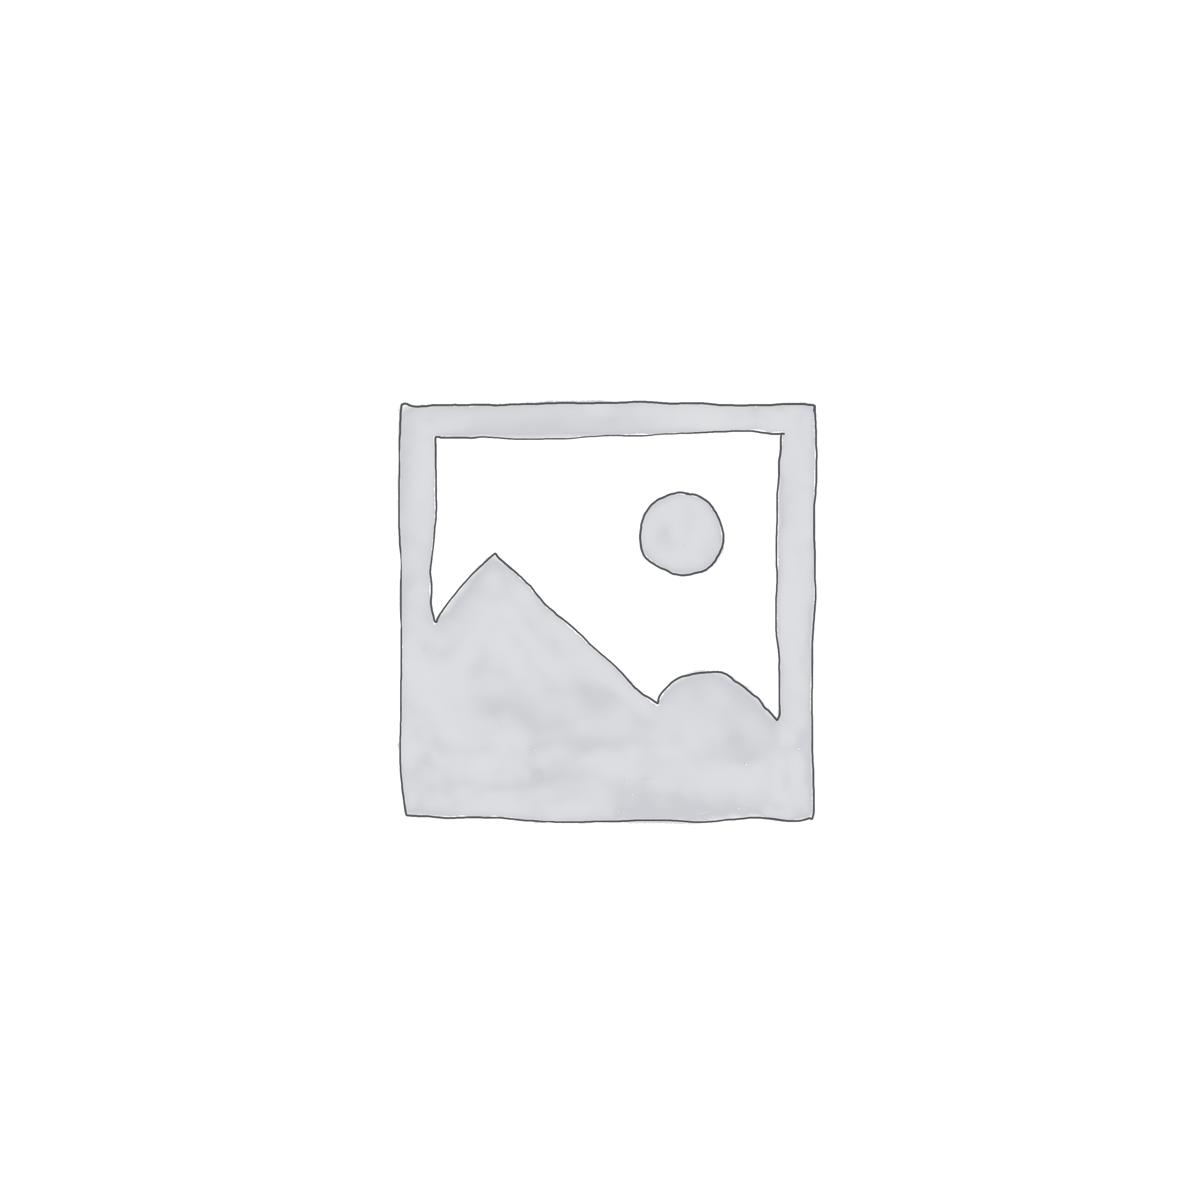 Хомут CE хром-никель-сталь DN 50мм, RSP RW4600050 (шт.)